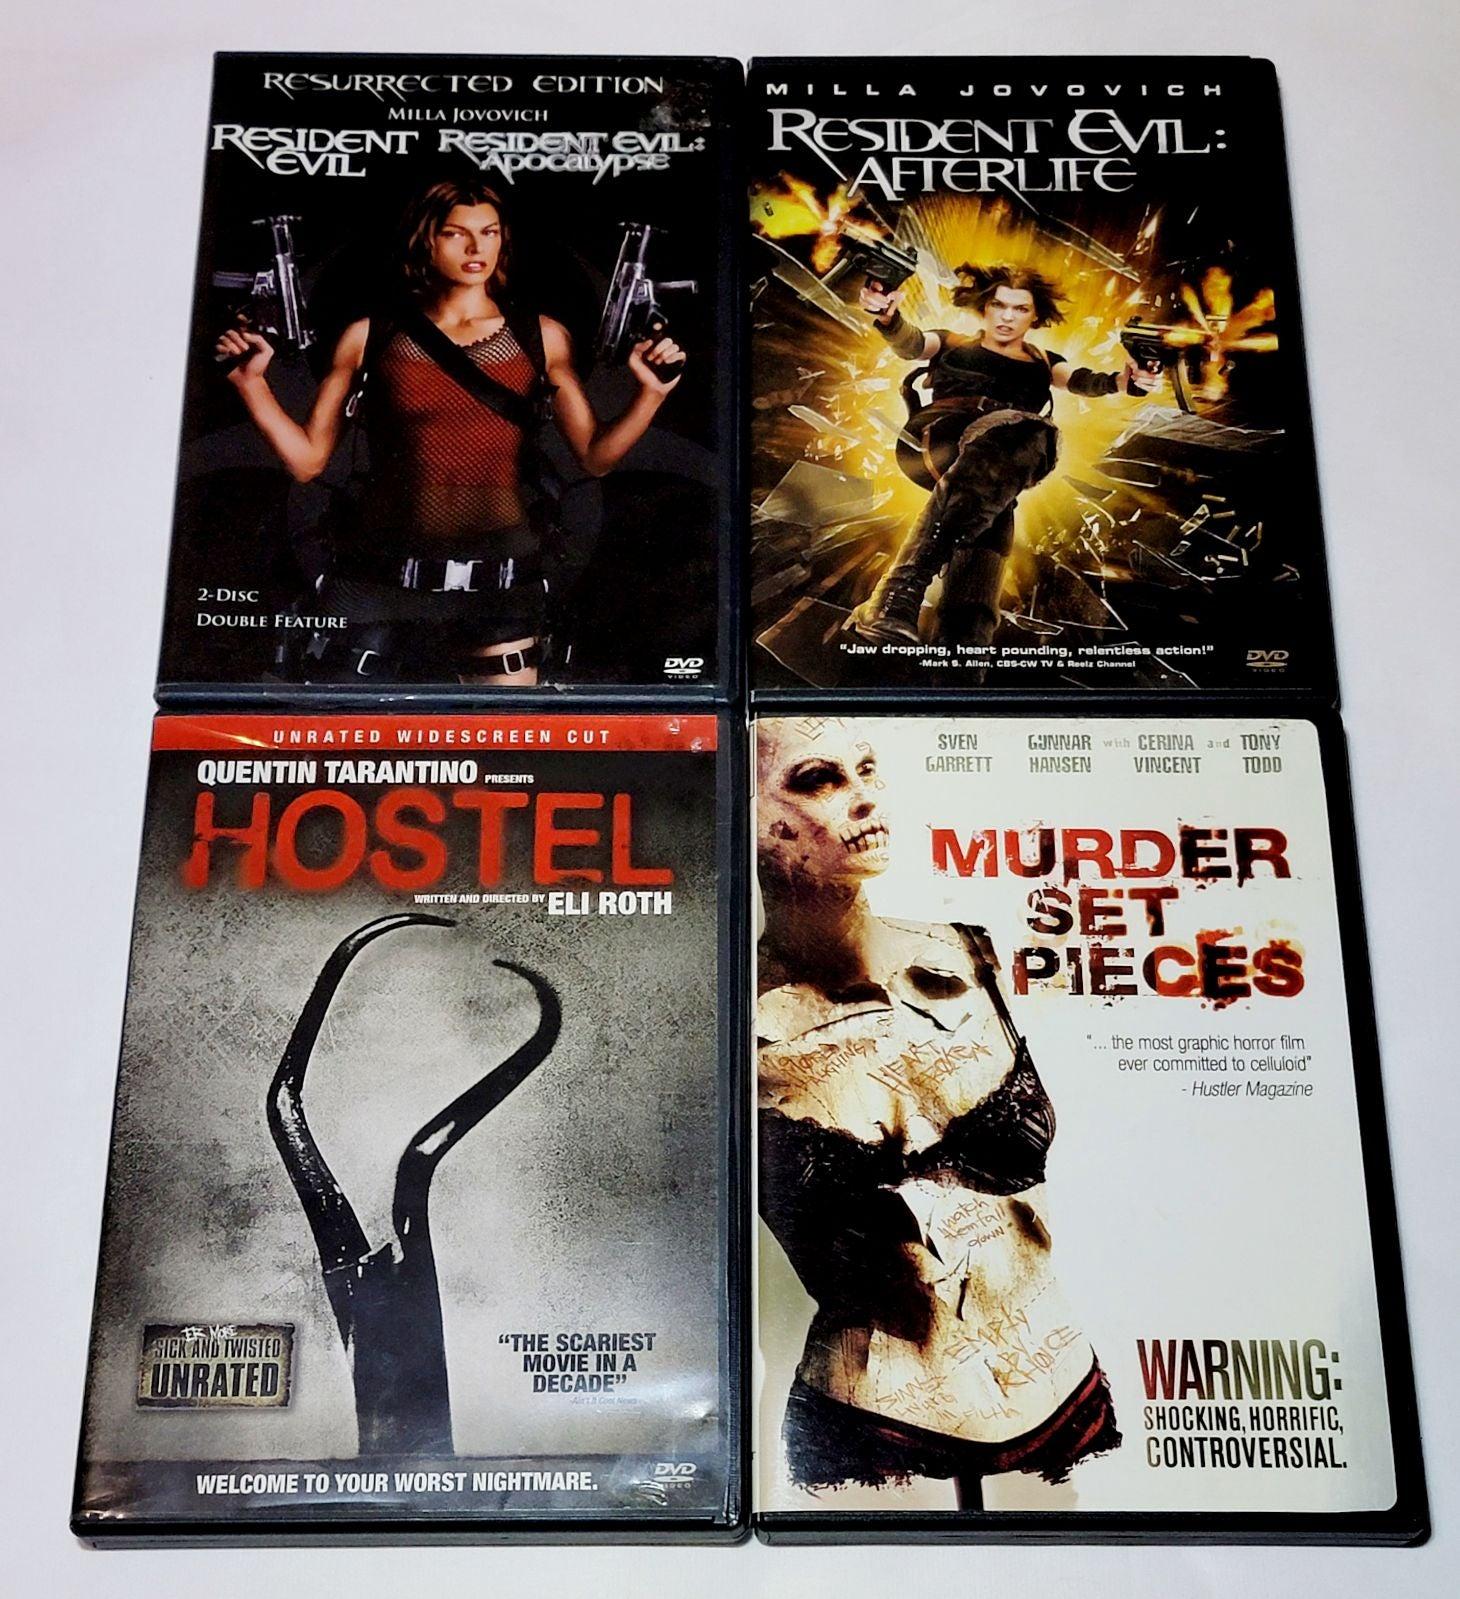 Murder Set Pieces, Hostel, Resident Evil